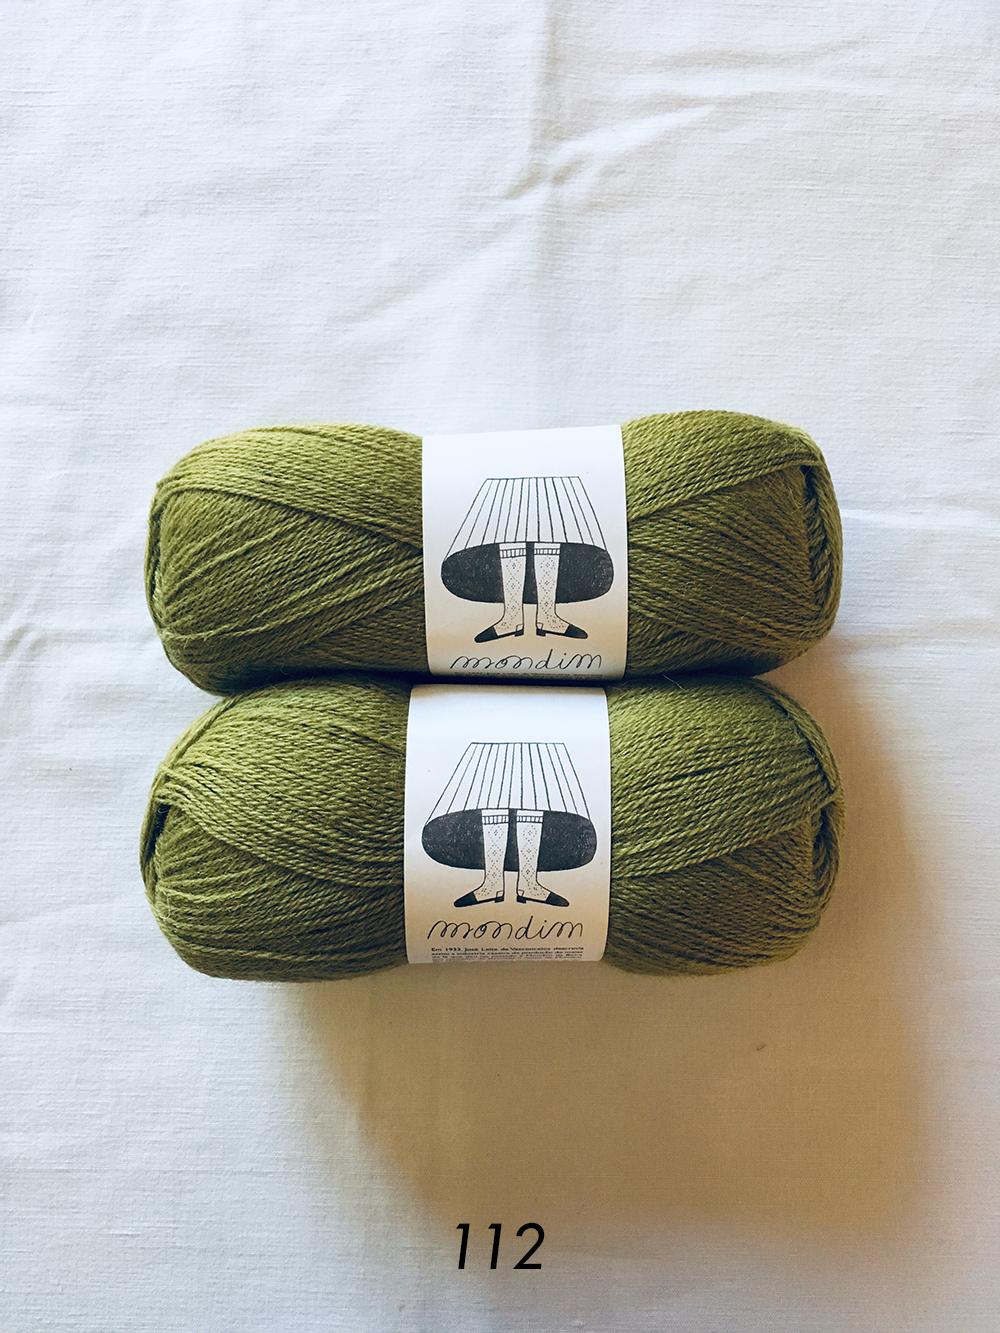 retrosaria_mondim_112_wool_done_knitting_.jpg